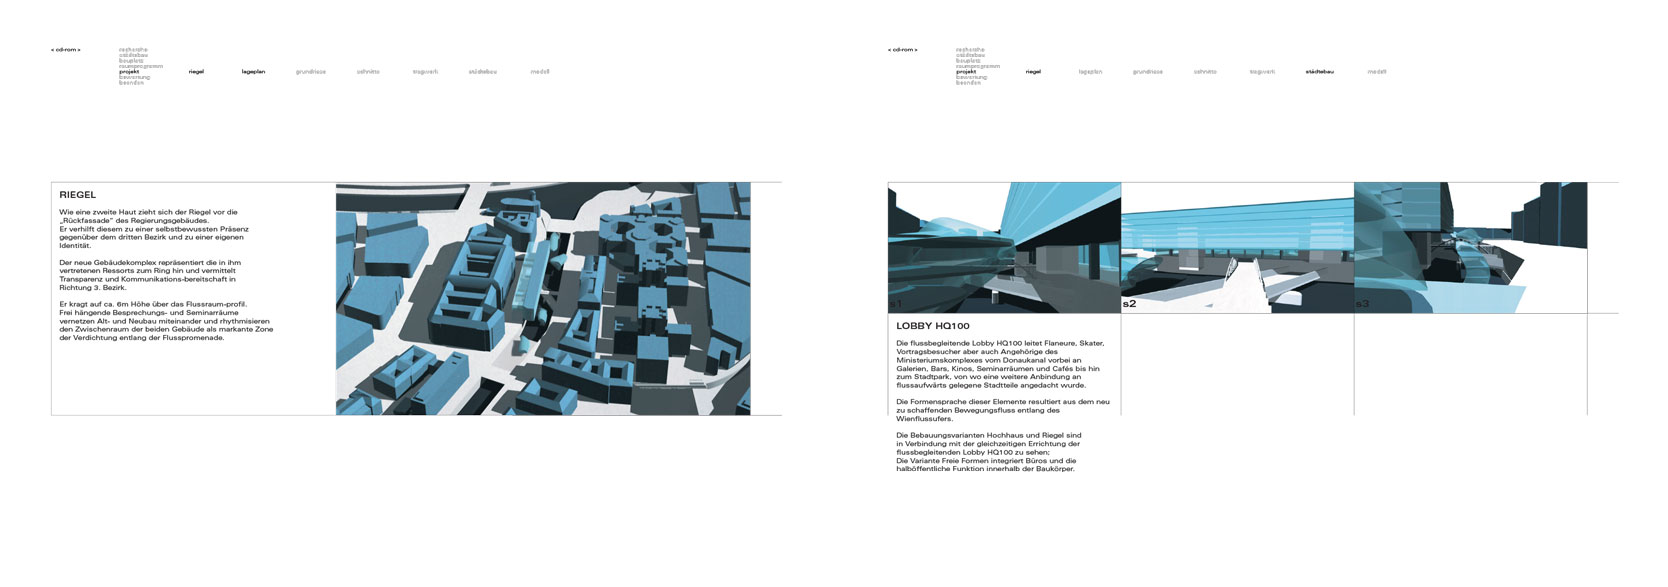 Wienfluss Architektur: Rendering Five-storey structure, Lobby HQ100